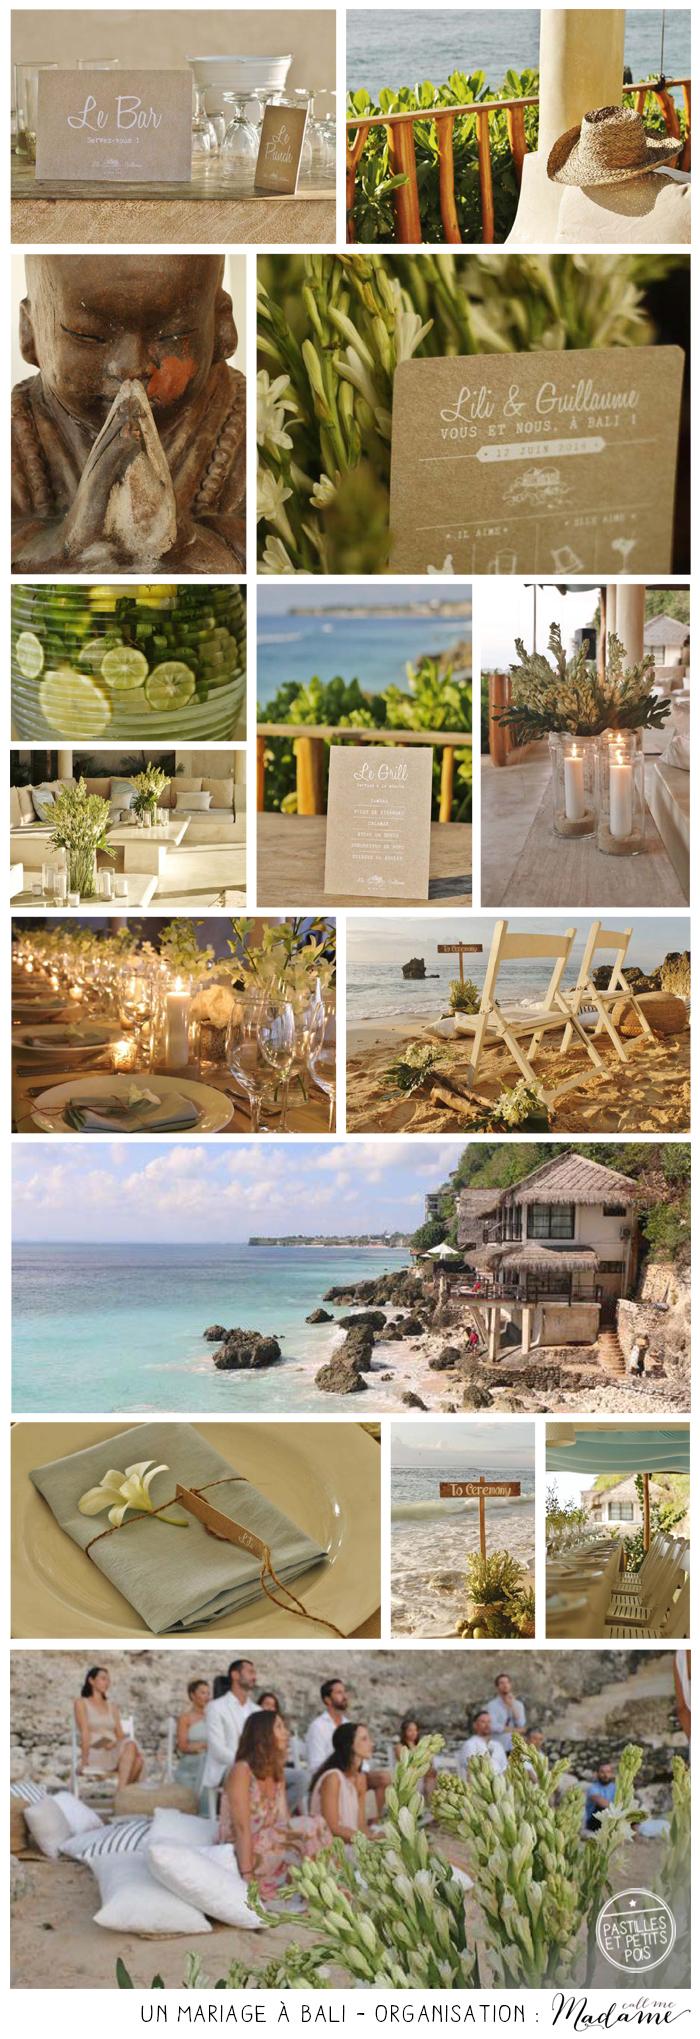 Mariage de rêve à Bali - Indonésie -mer